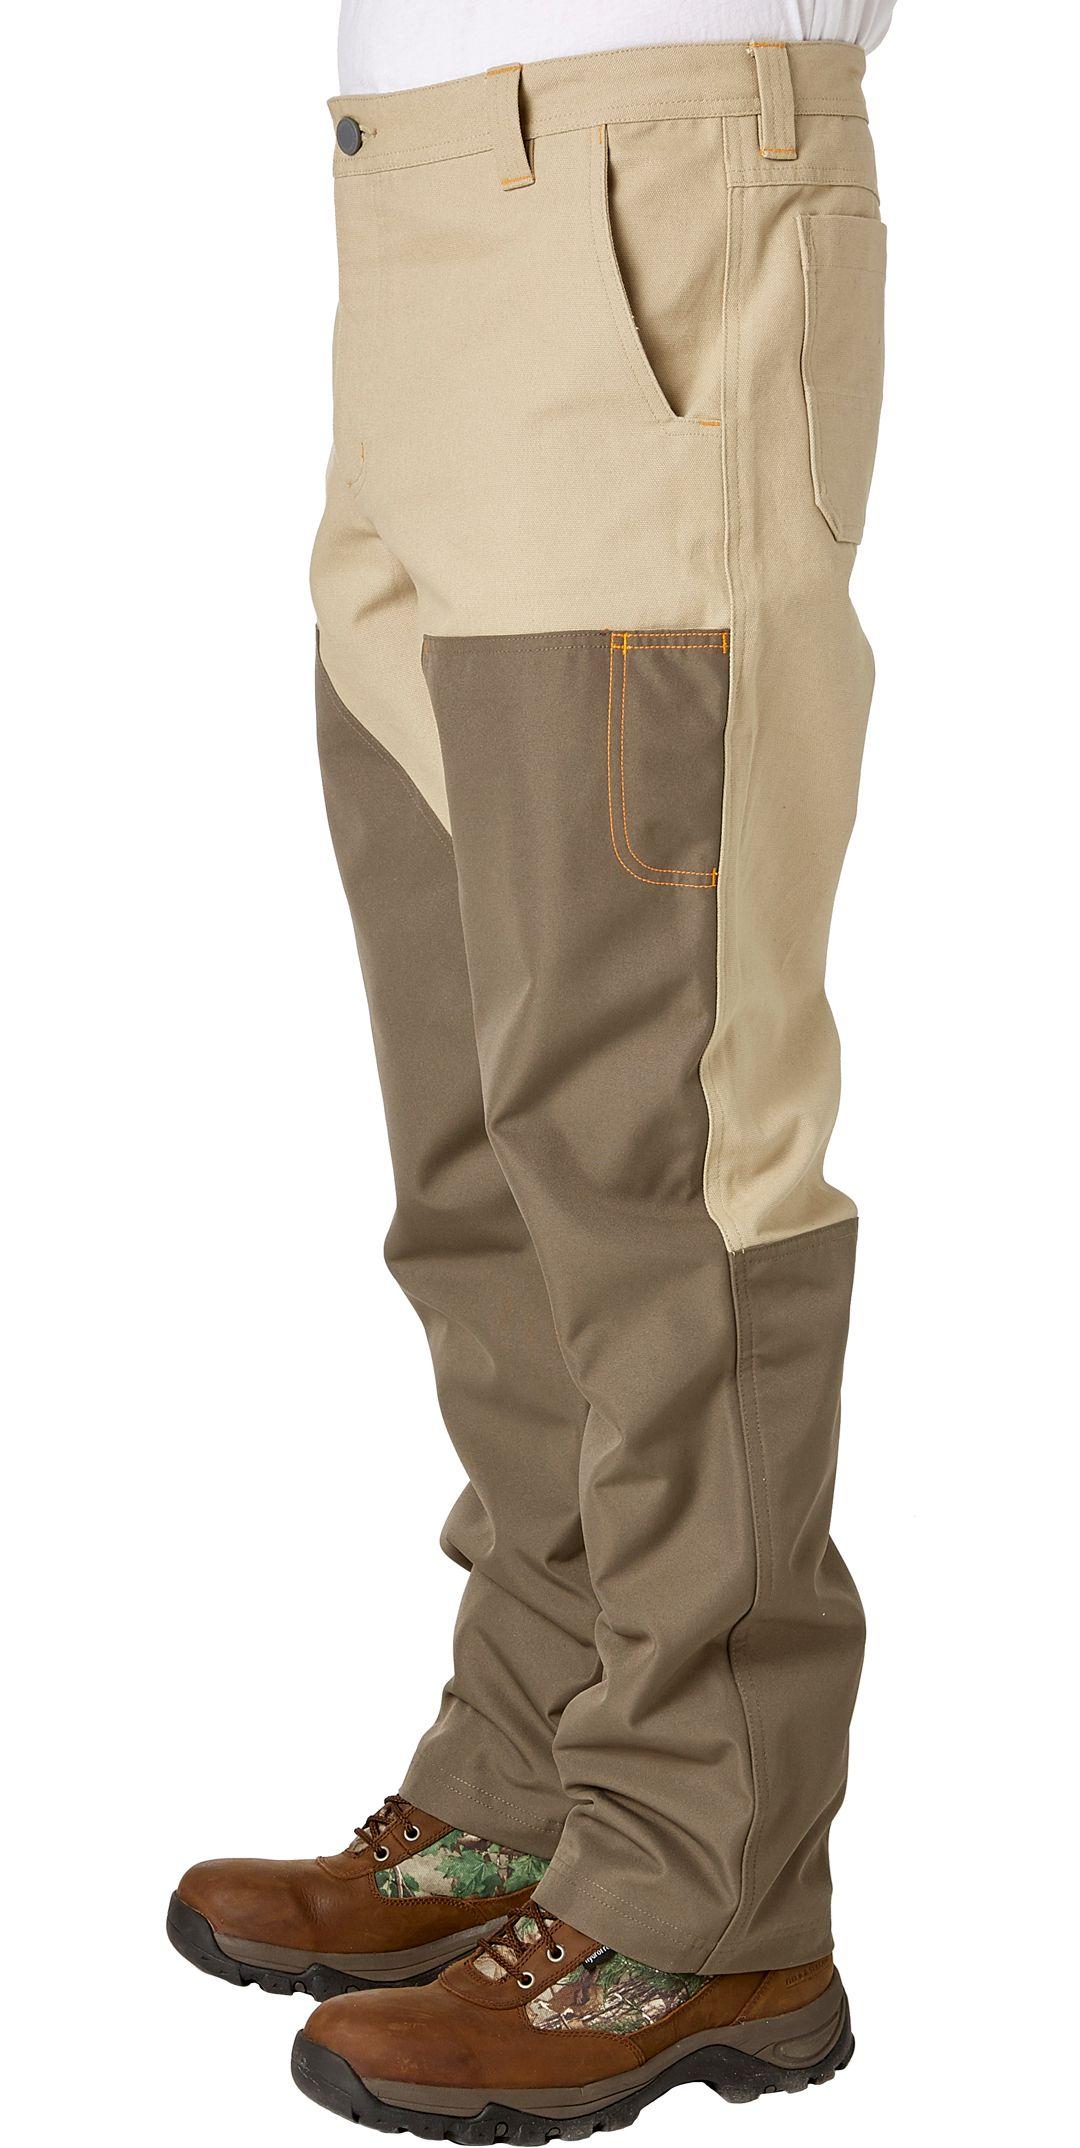 1aa33620f99a2 Field & Stream Men's Every Hunt Field Pants | DICK'S Sporting Goods